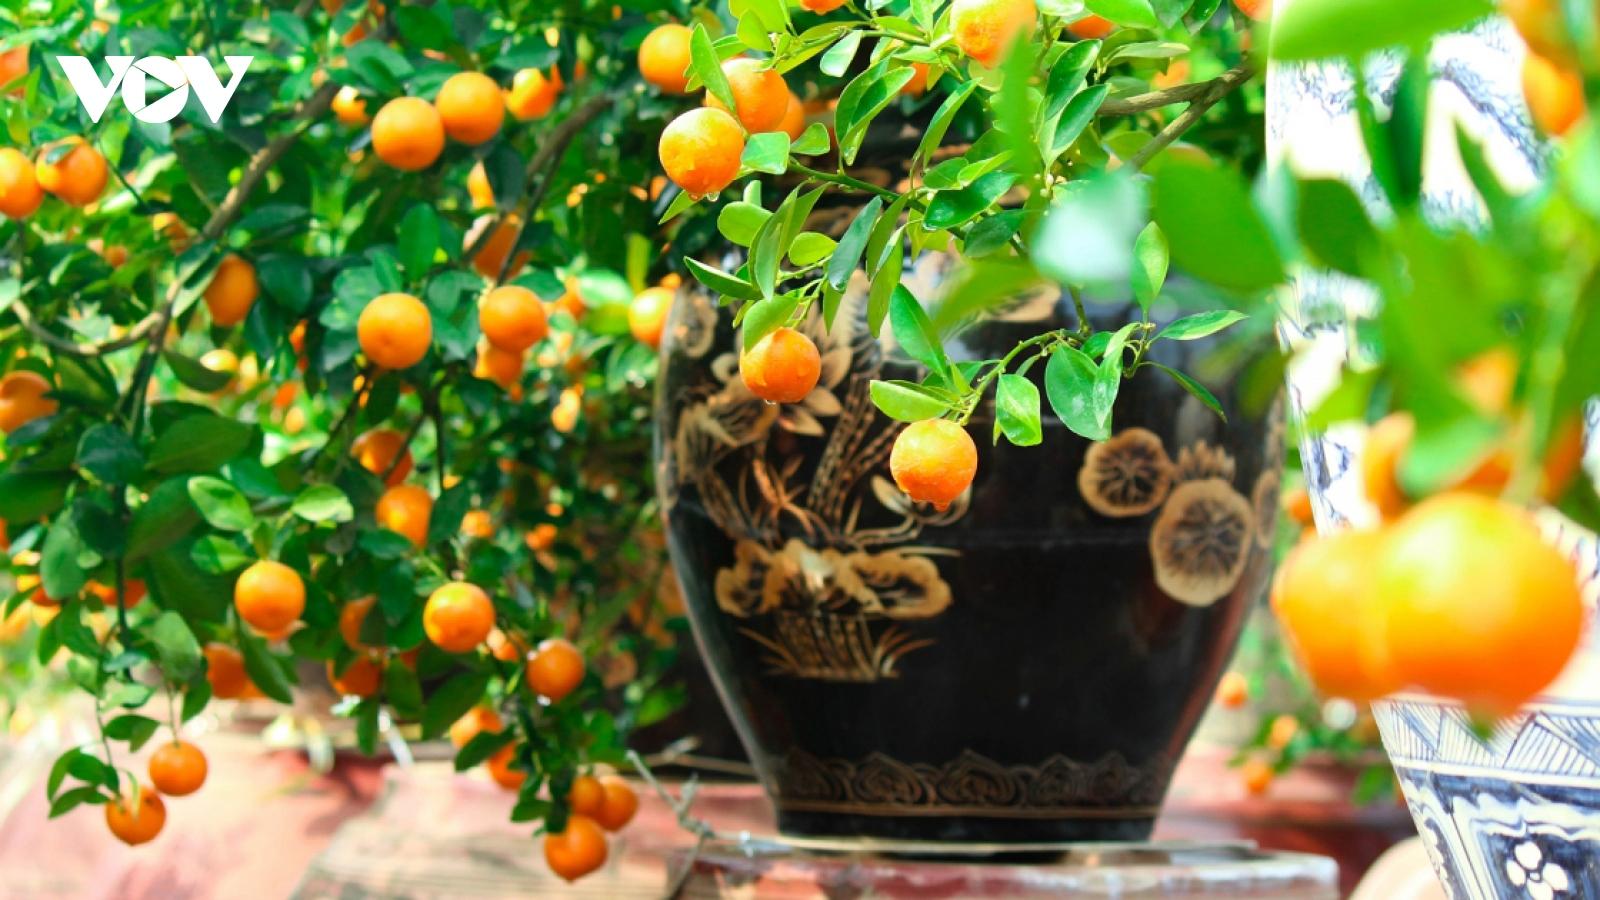 Tu Lien kumquat village prepares for Tet holiday